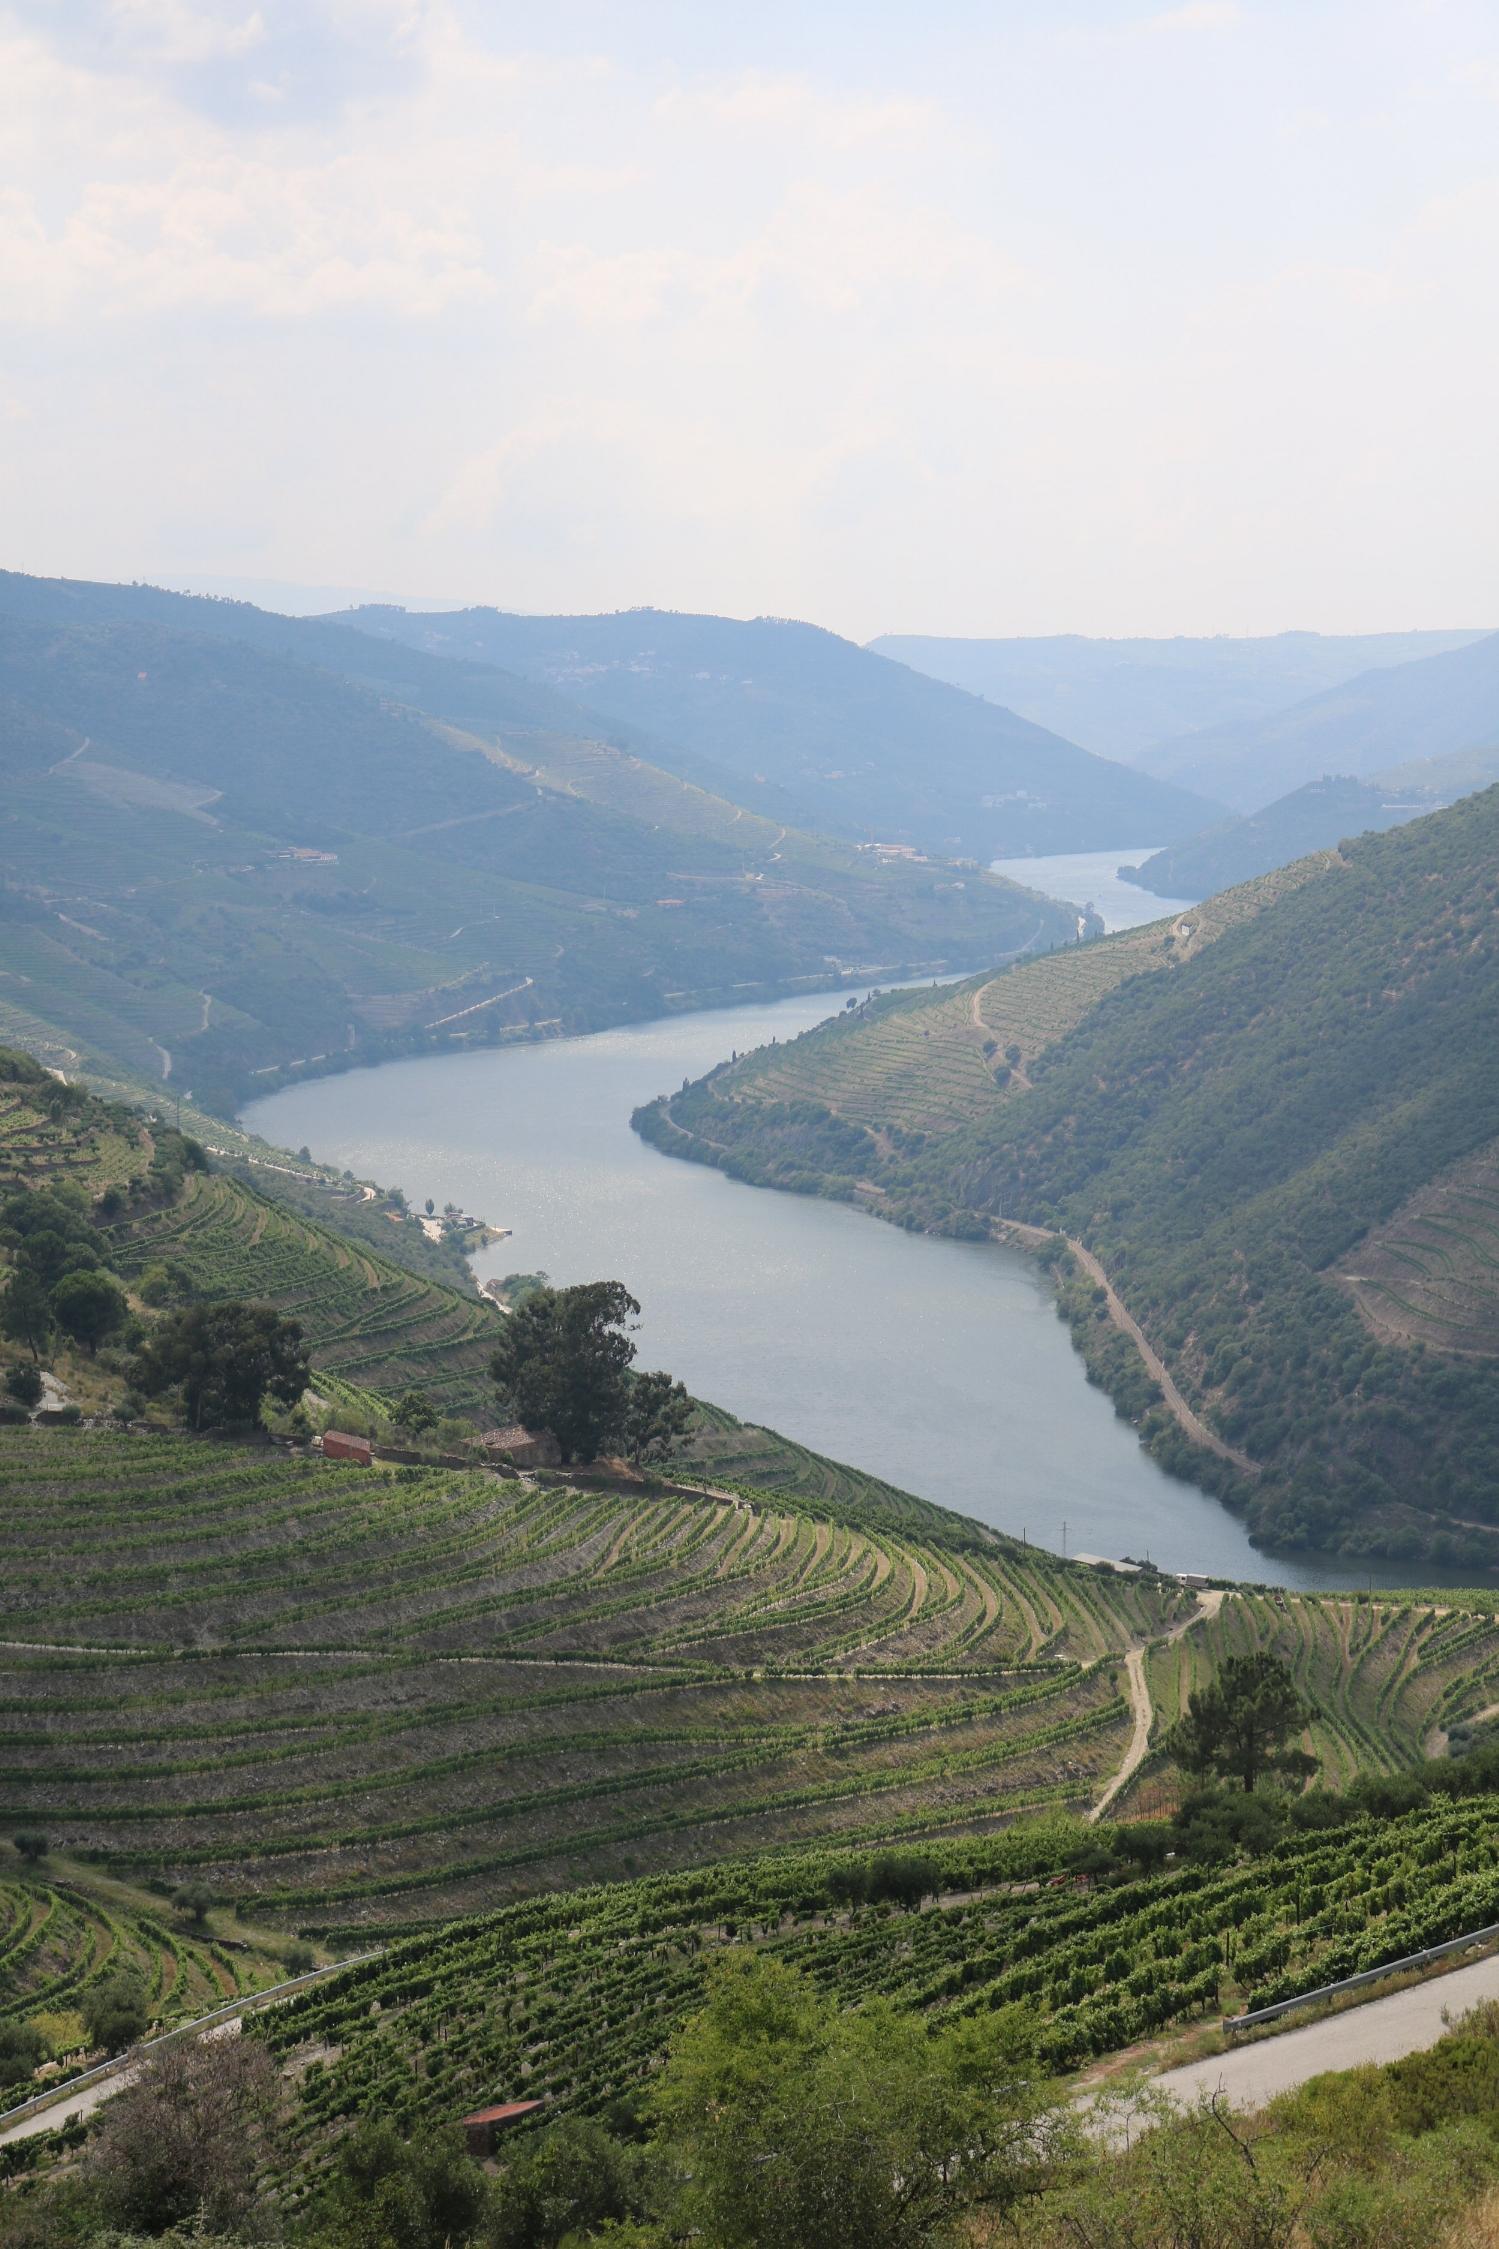 The Douro Wine Region in Northern Portugal